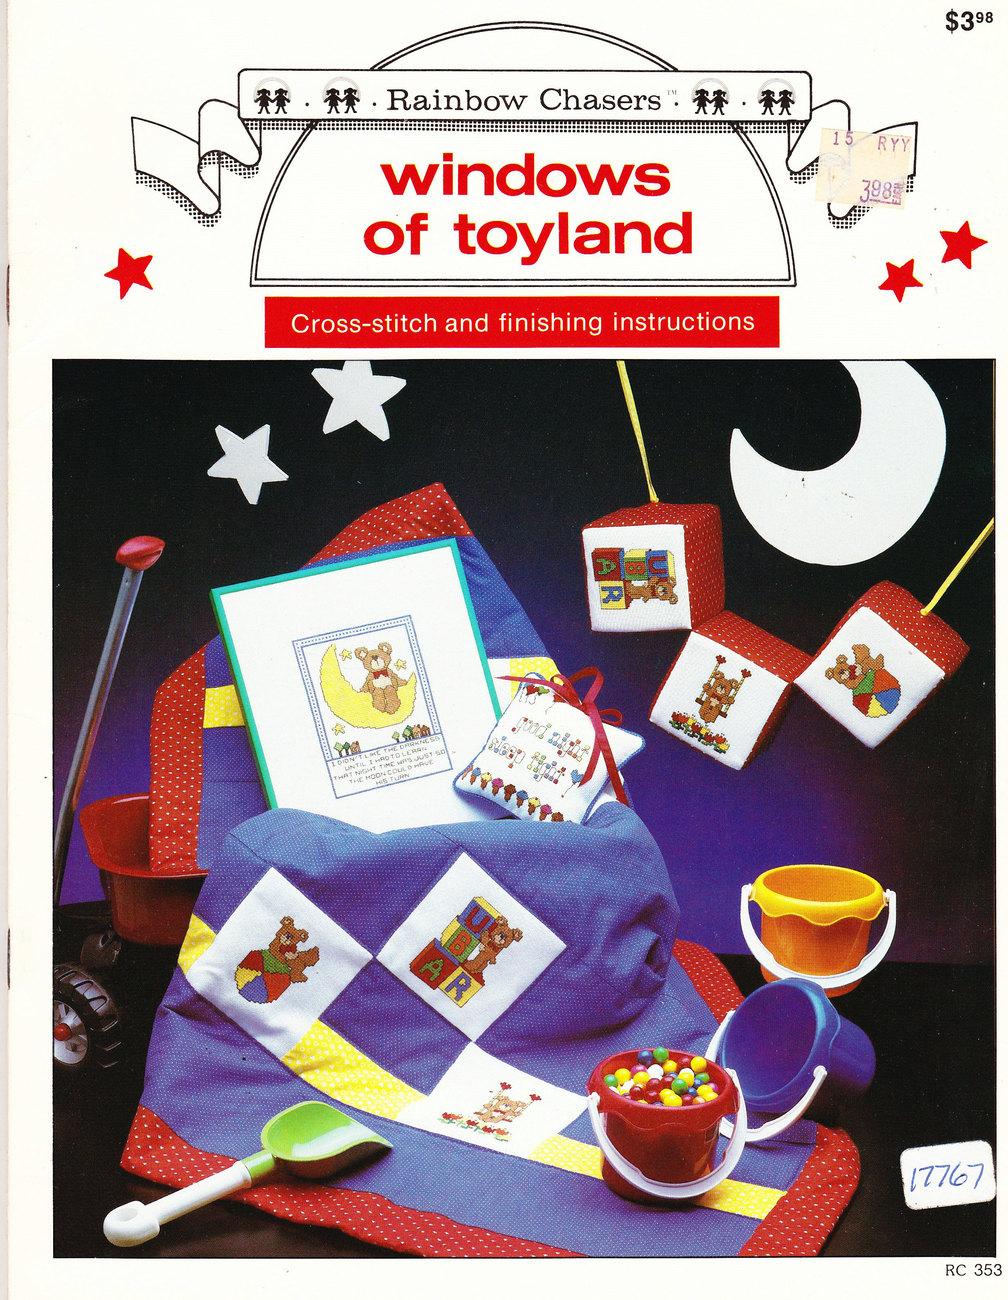 NEW CROSS STITCH WINDOWS OF TOYLAND RAINBOW CHASERS - $3.95